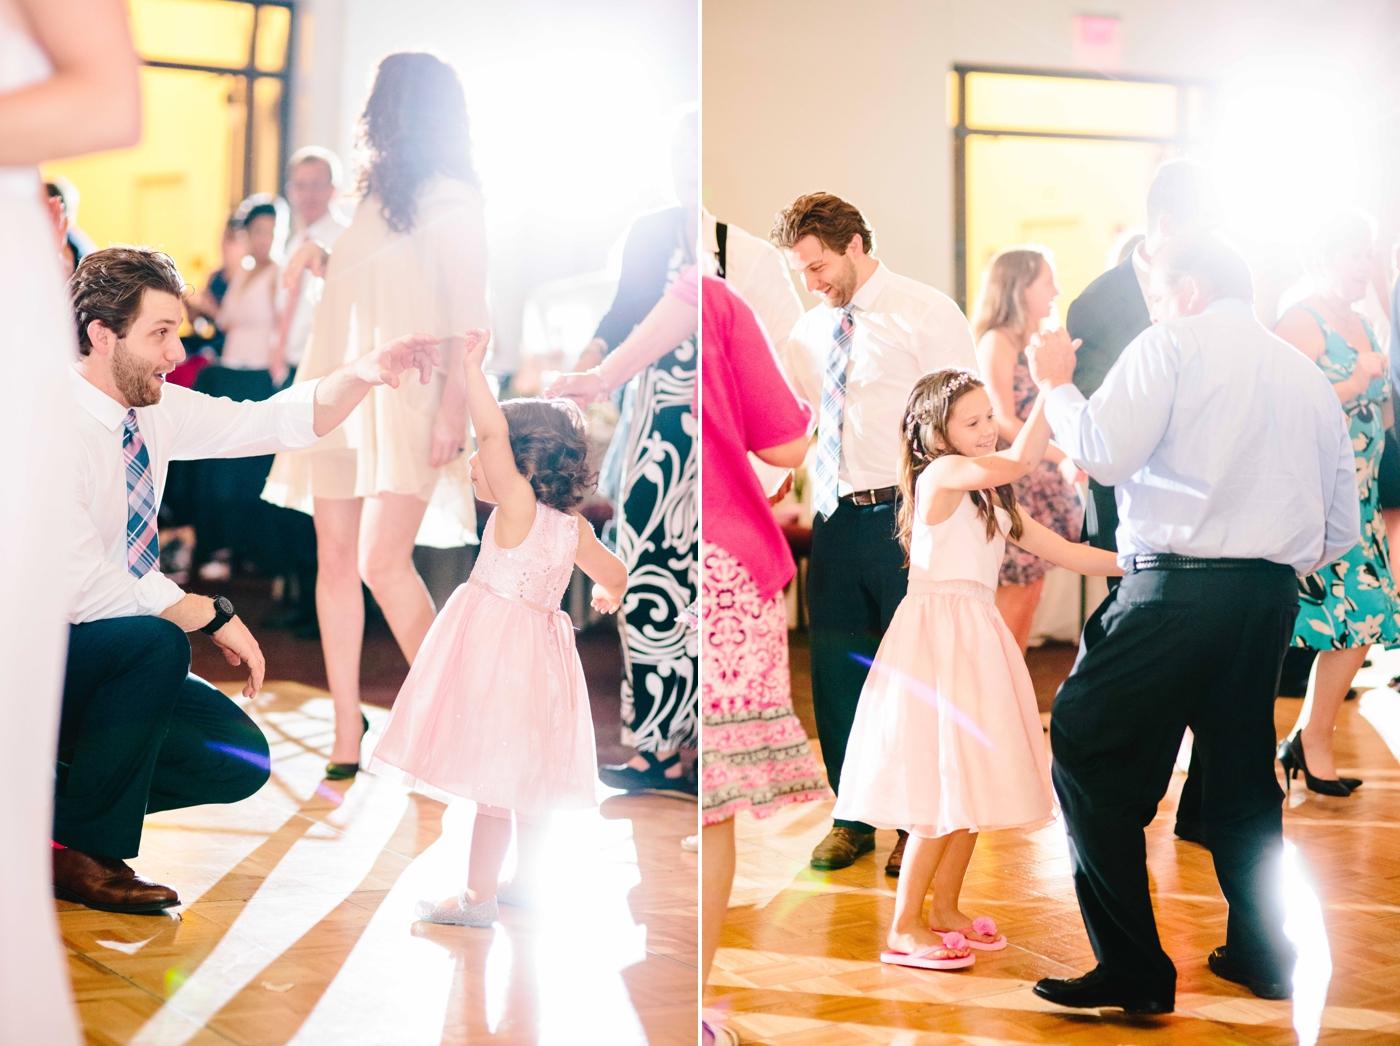 chicago-fine-art-wedding-photography-svihra28